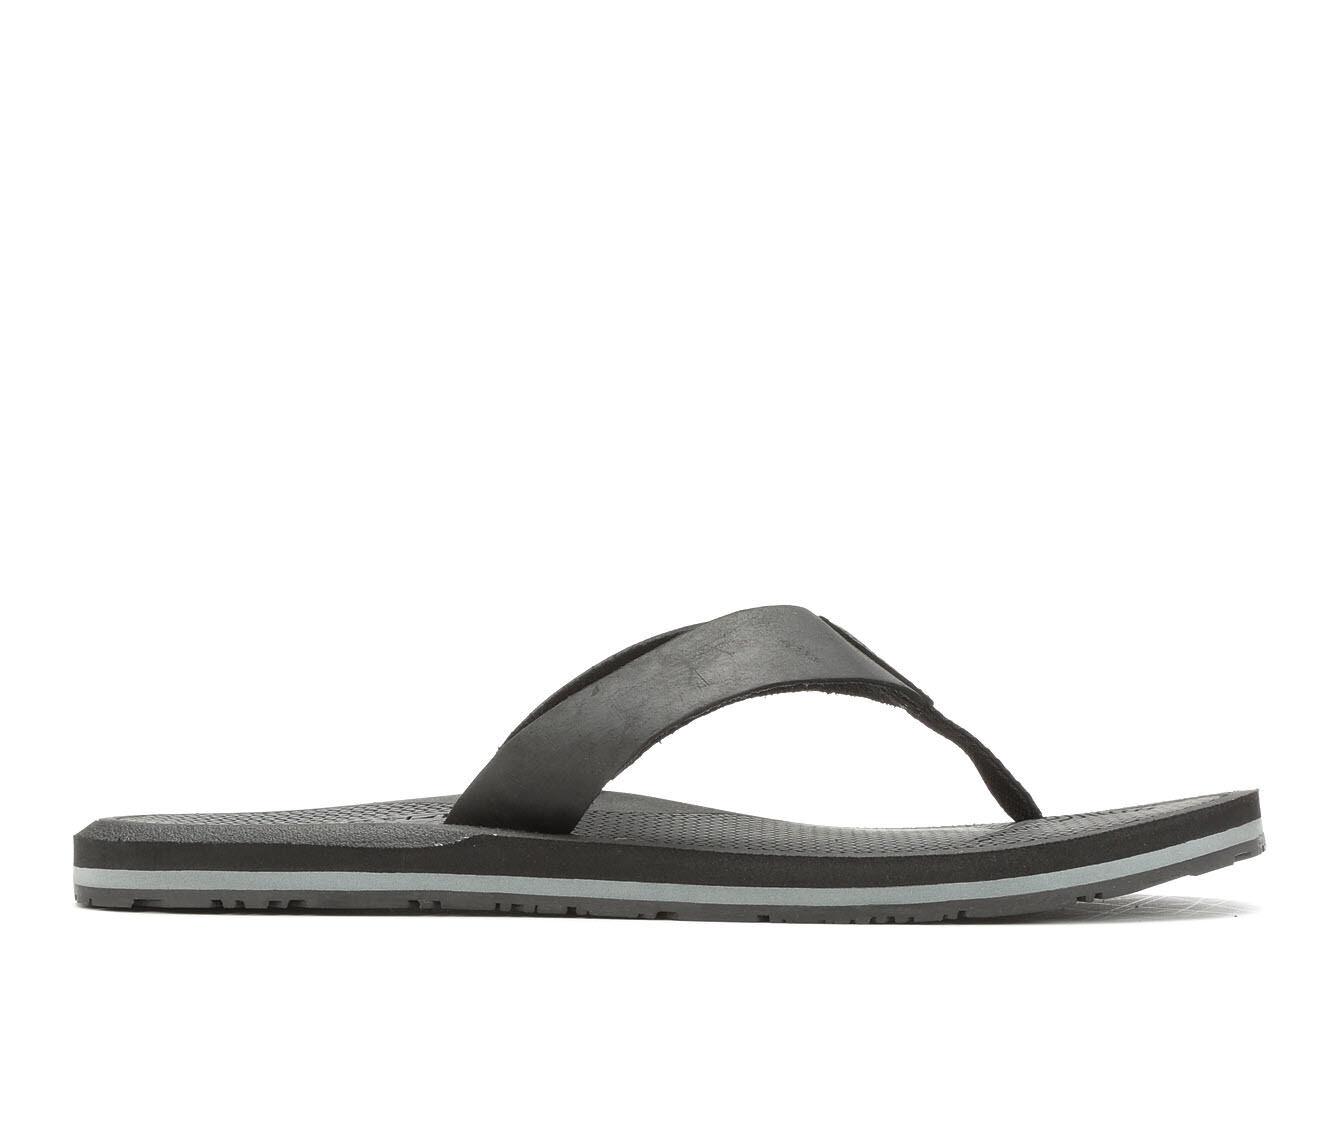 buy latest style Men's Sperry Pensacola Thong Flip-Flops Black